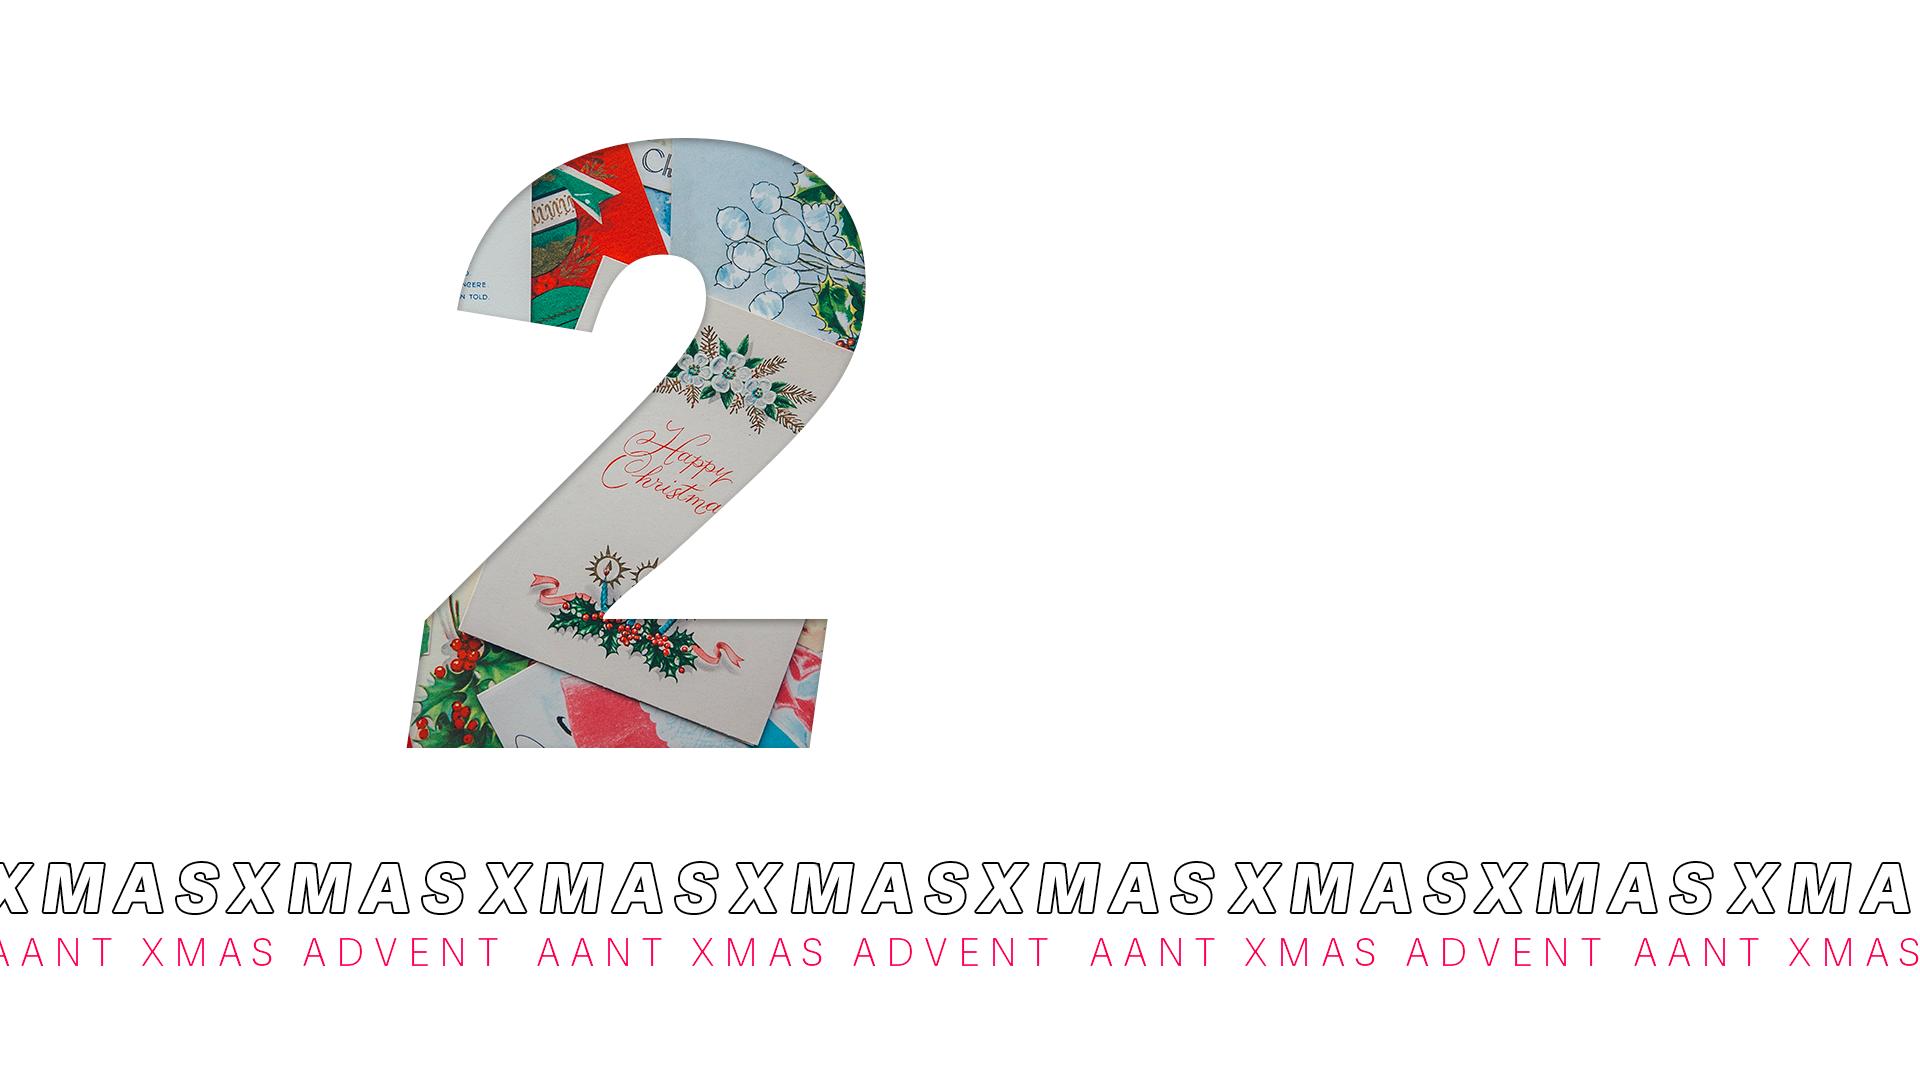 AANT XMAS ADVENT – 2 DICEMBRE 2020